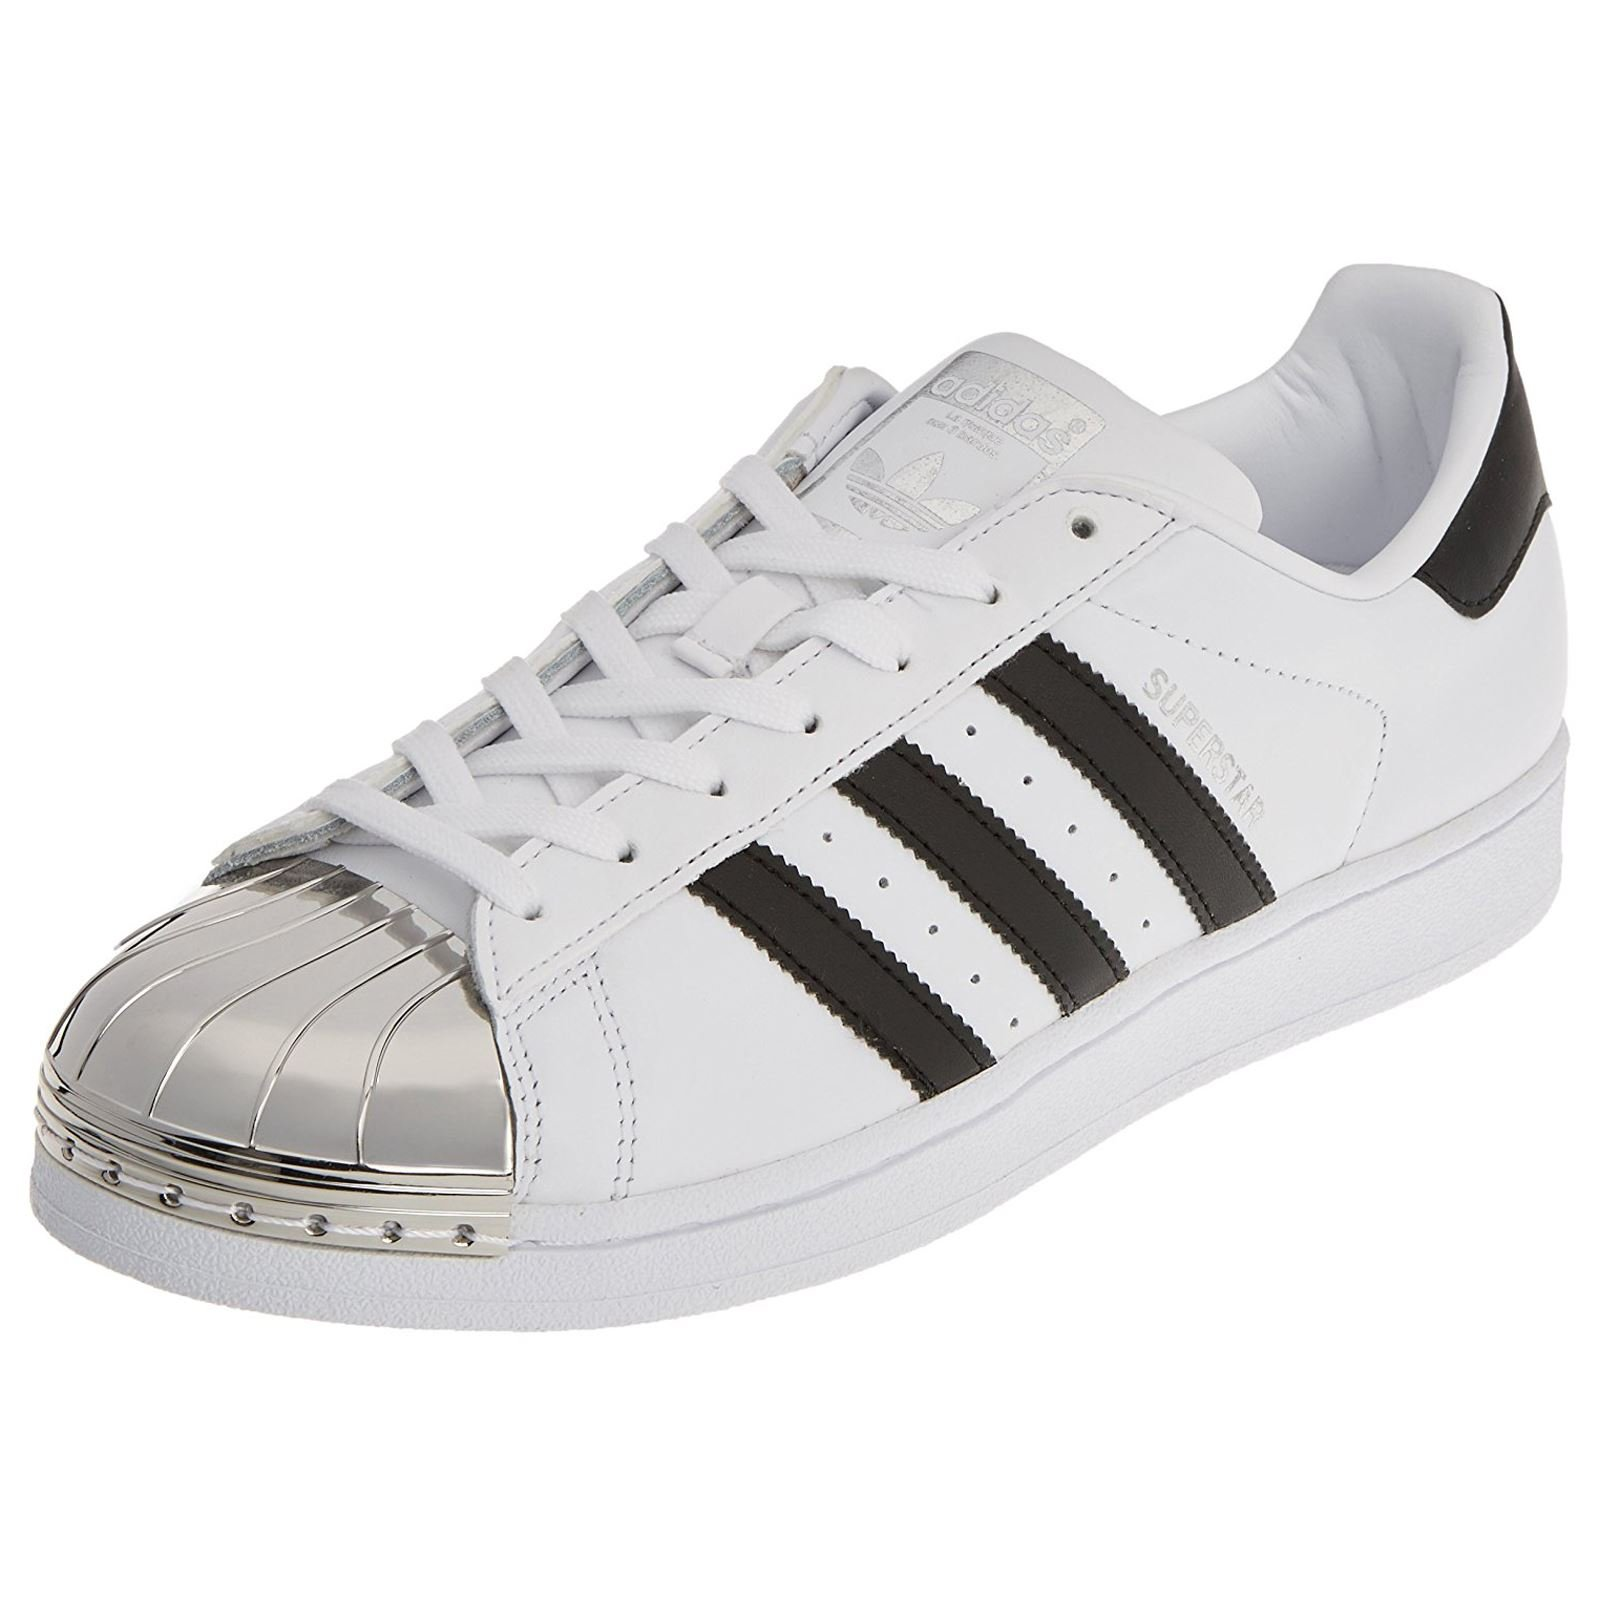 adidas Originals Women's Superstar 80S Metal Toe Trainers Footwear US6 White